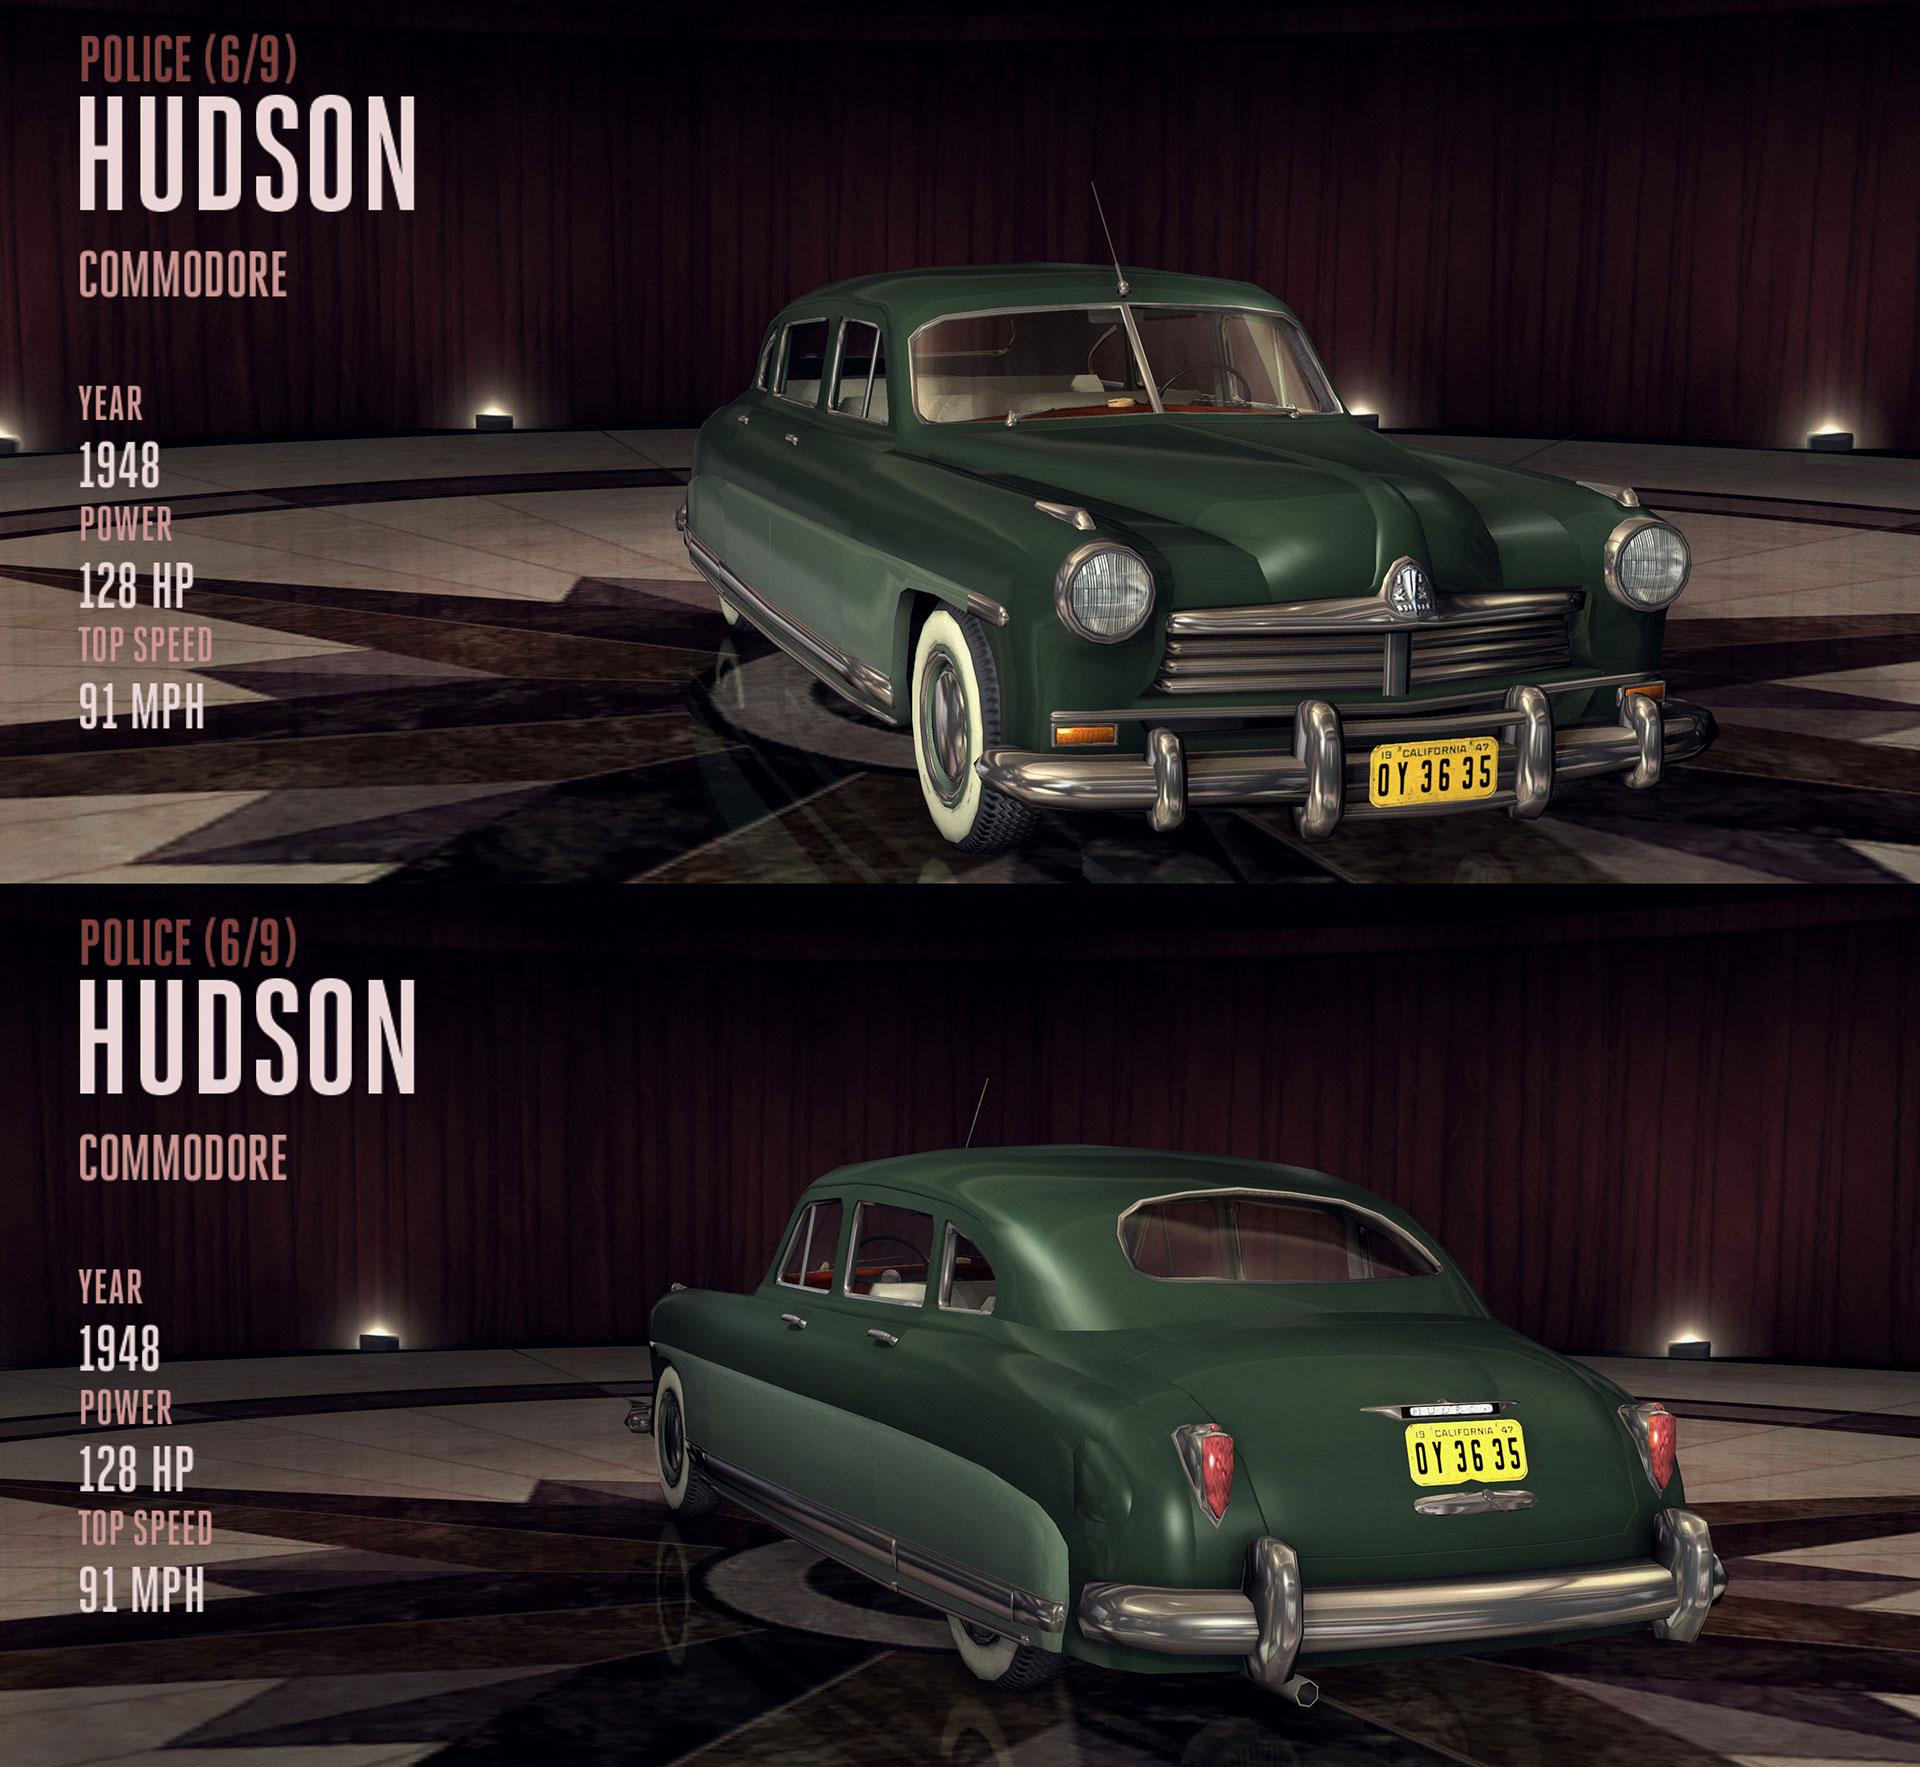 Archivo:1948-hudson-commodore.jpg